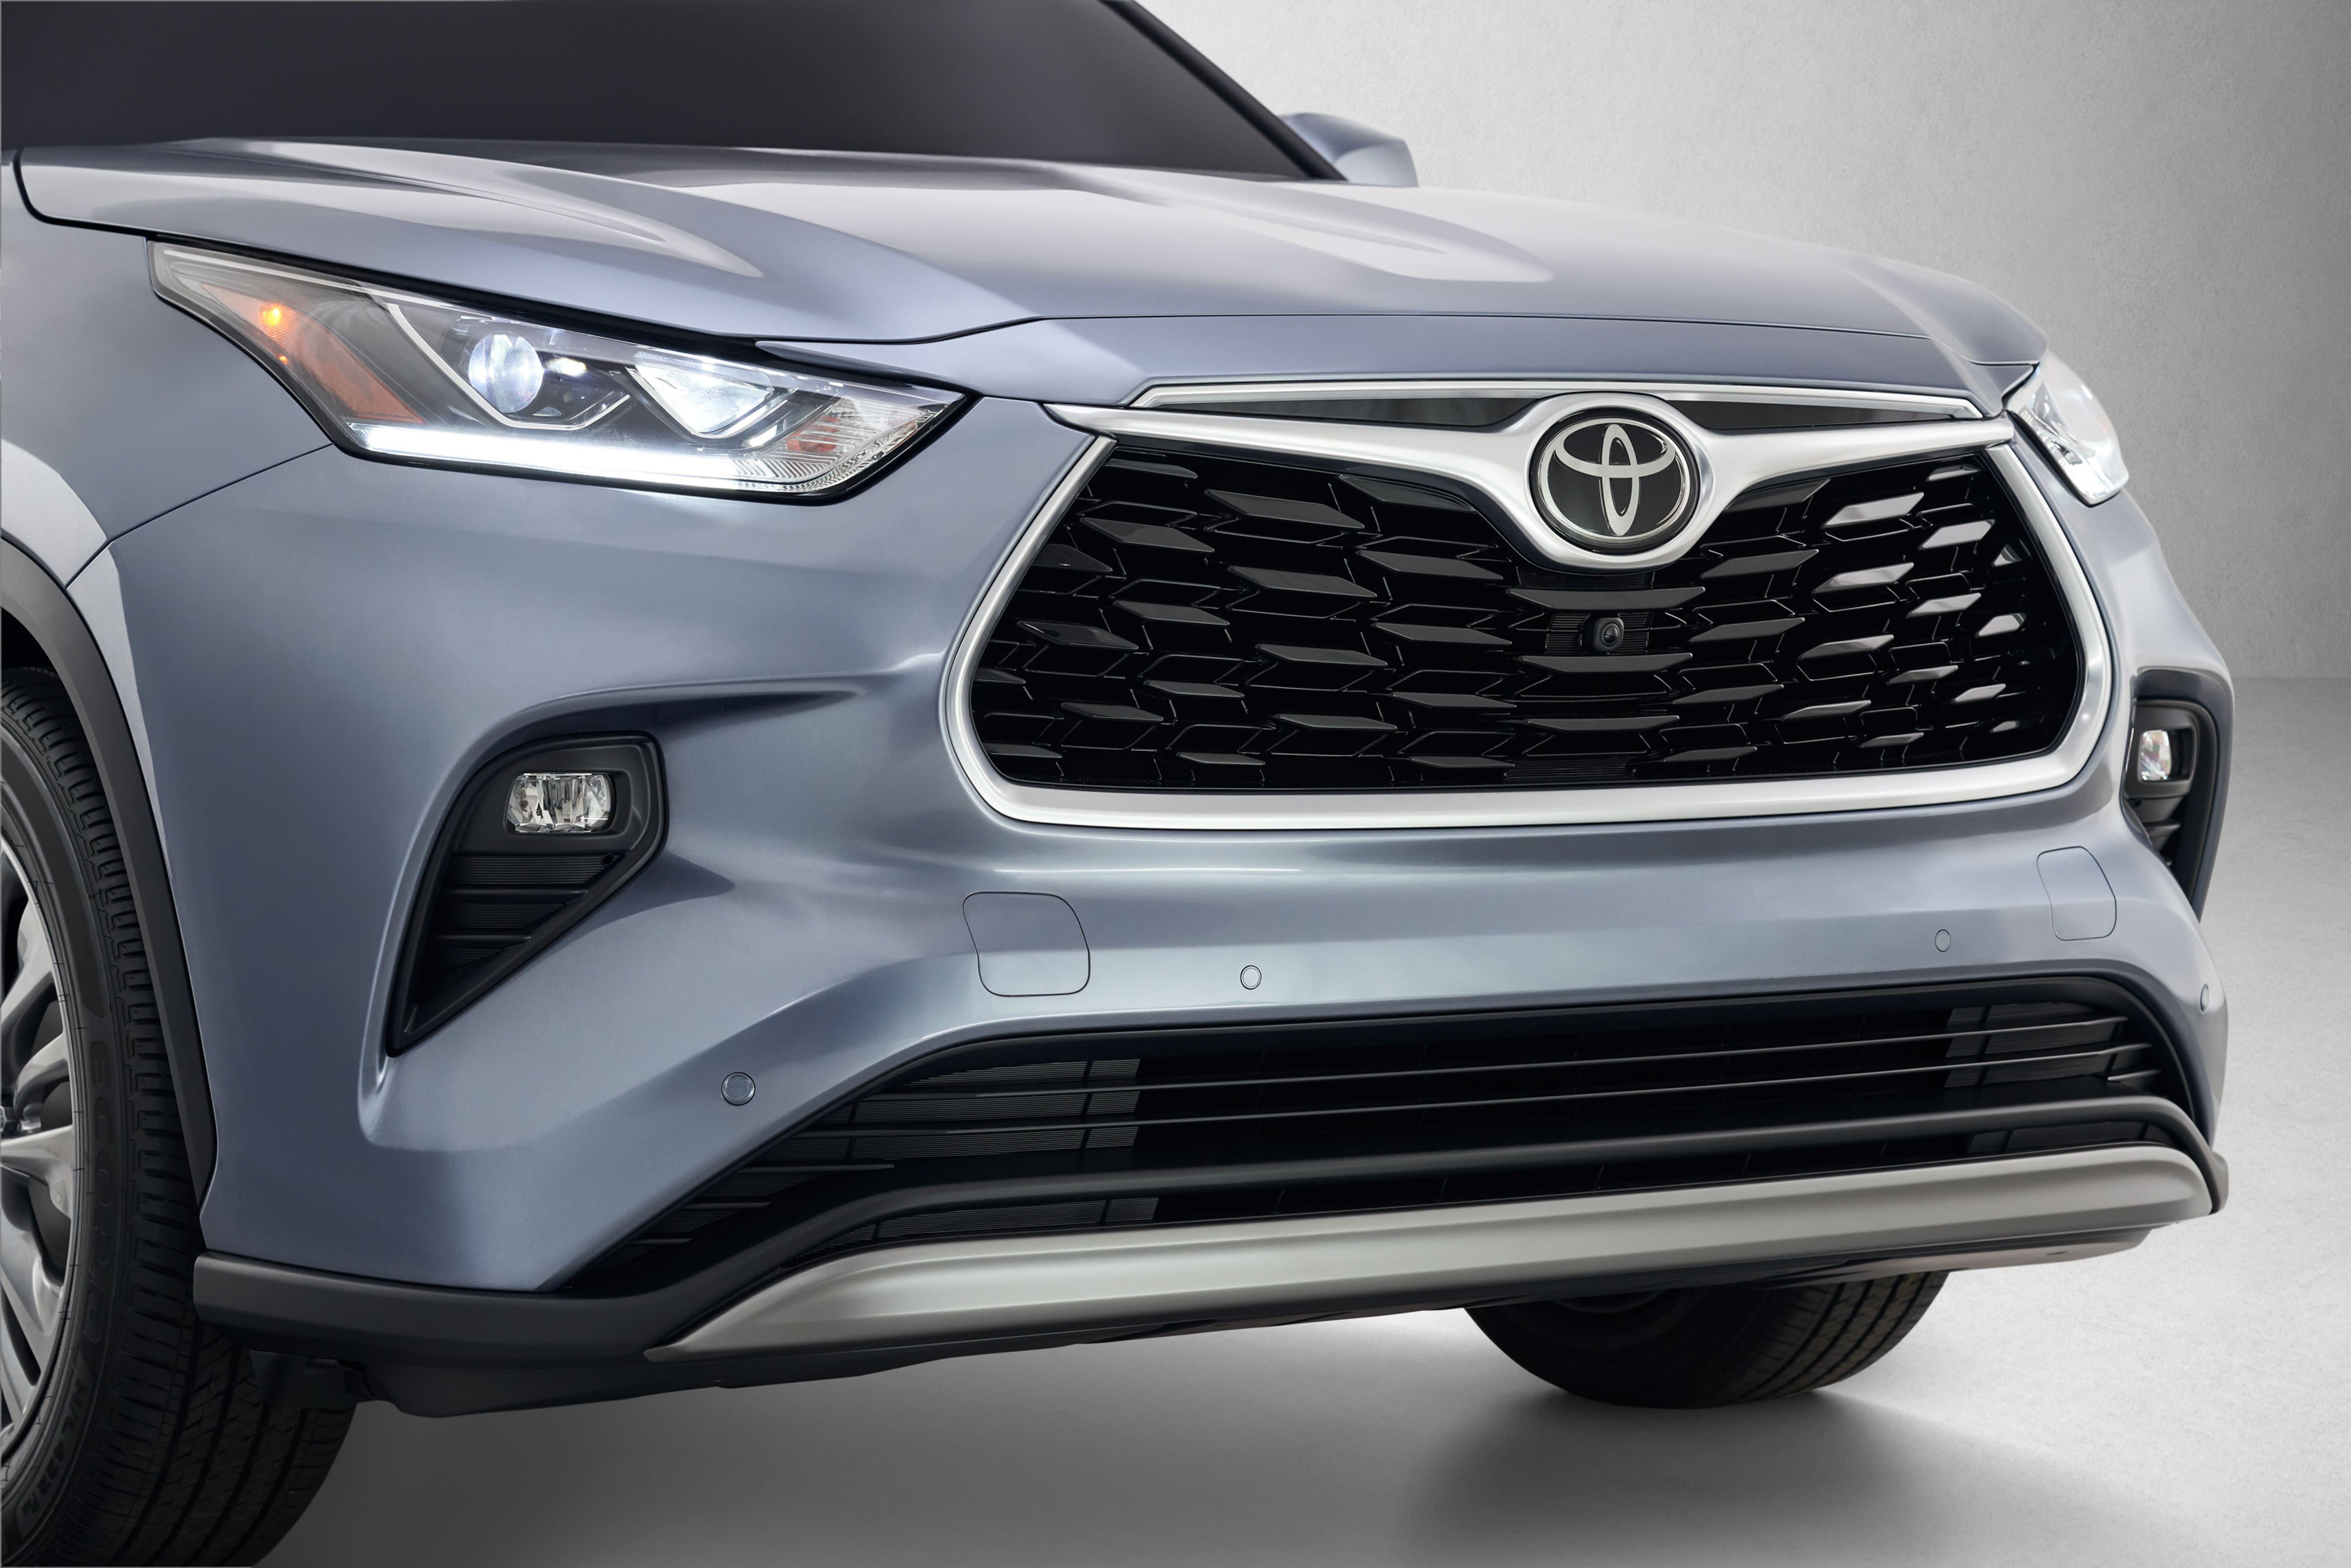 2020 Toyota Highlander: Redesign, Changes, Arrival >> See 2020 Toyota Highlander Photos